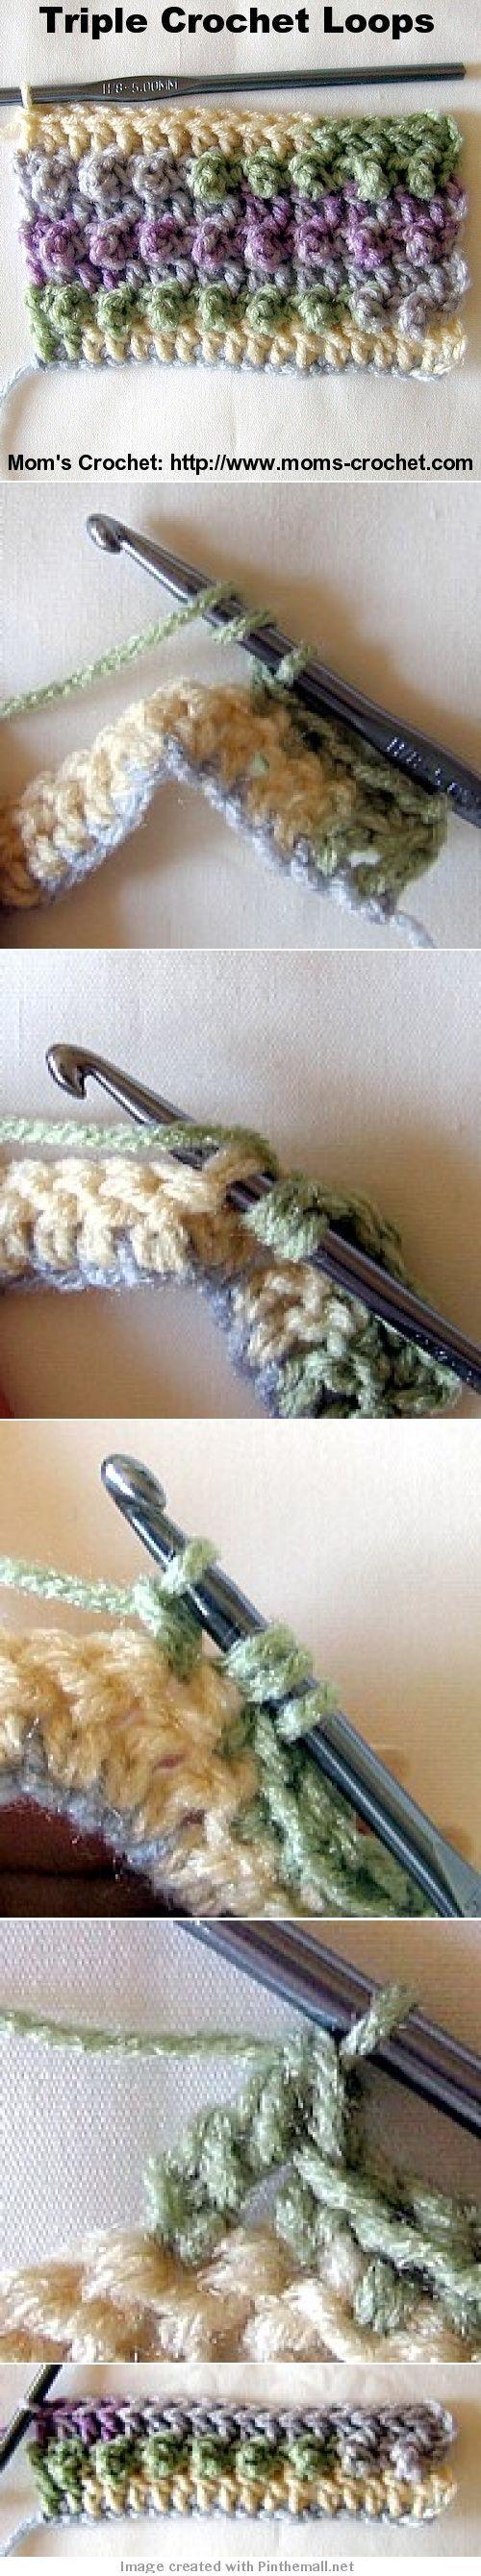 Crochet Nubby Stitch : Crochet #Tutorials - Terrific nubby stitch for when you want that ...